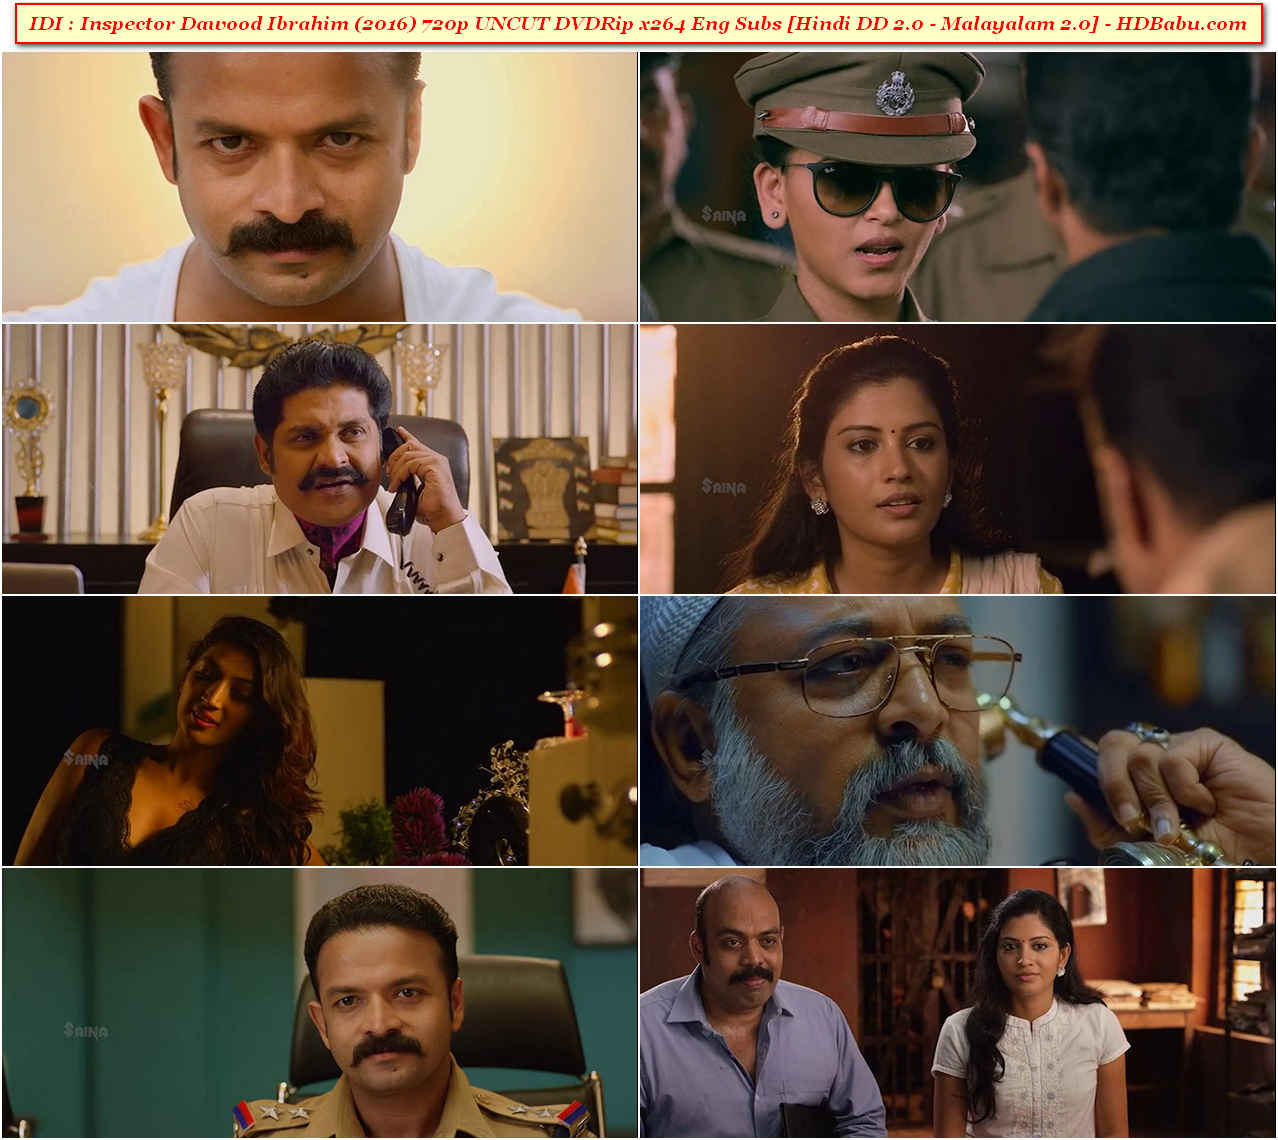 IDI : Inspector Dawood Ibrahim Hindi Dubbed Movie Download